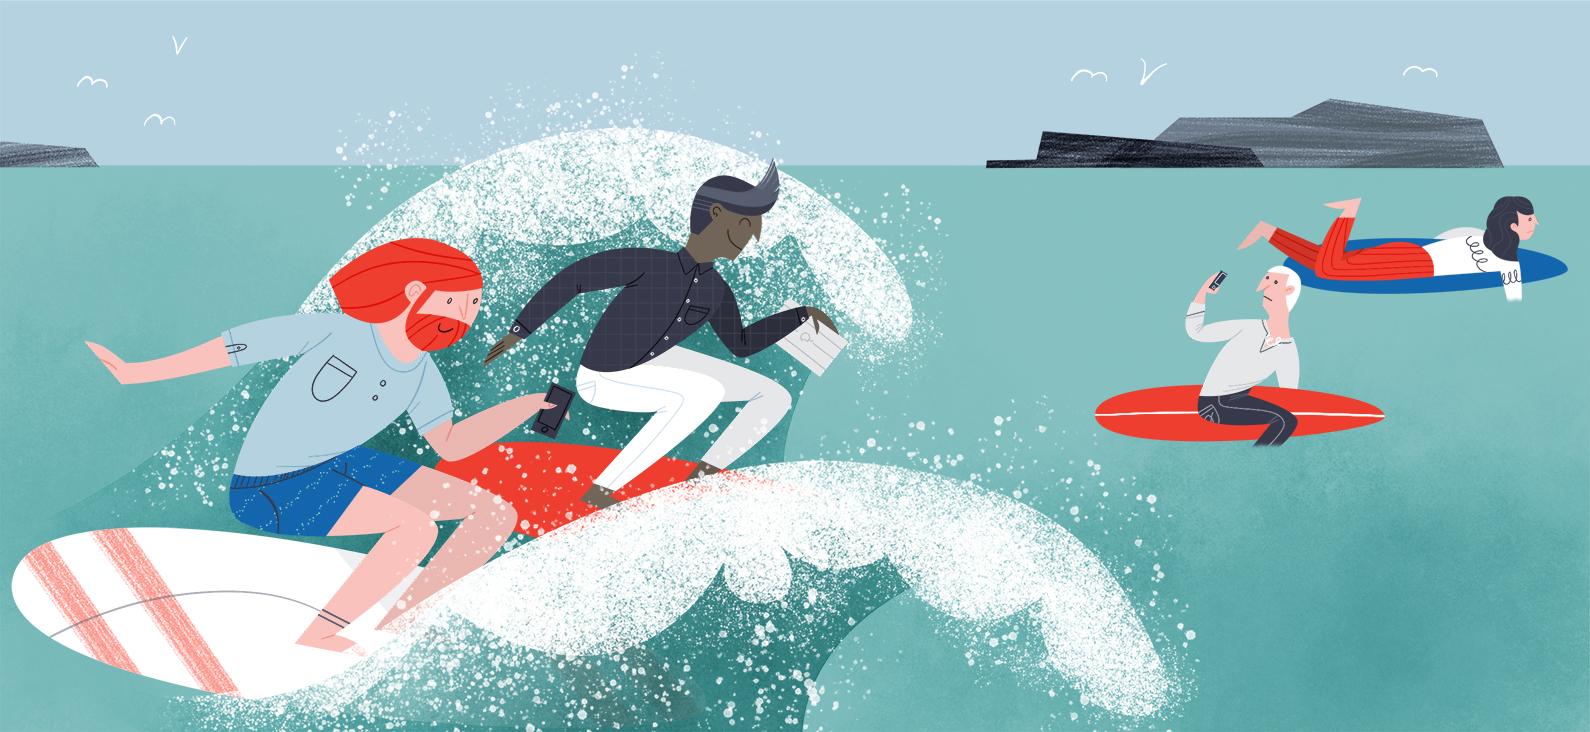 Kiplinger's Personal Finance, December 2017 - Illustration: Valéry Goulet   -Art direction:  Yajaira A. St. Fleurant